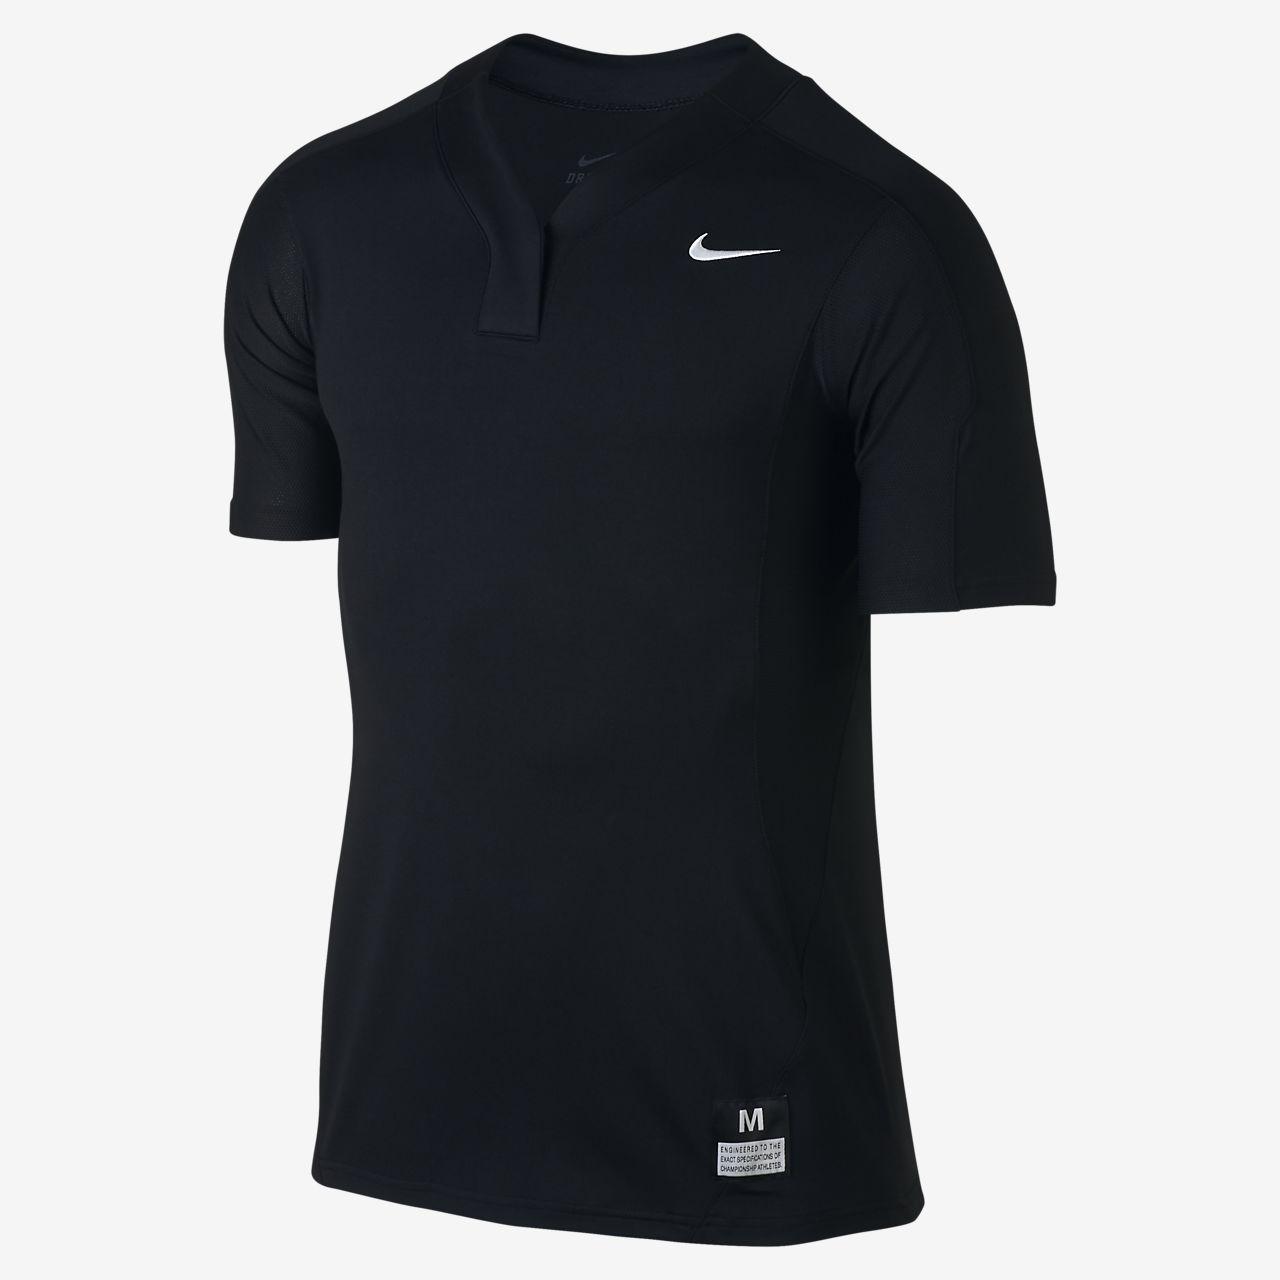 Nike Vapor Dri-FIT Stock Baseball Jersey Boys Team Black/Team Blue Grey/Team White